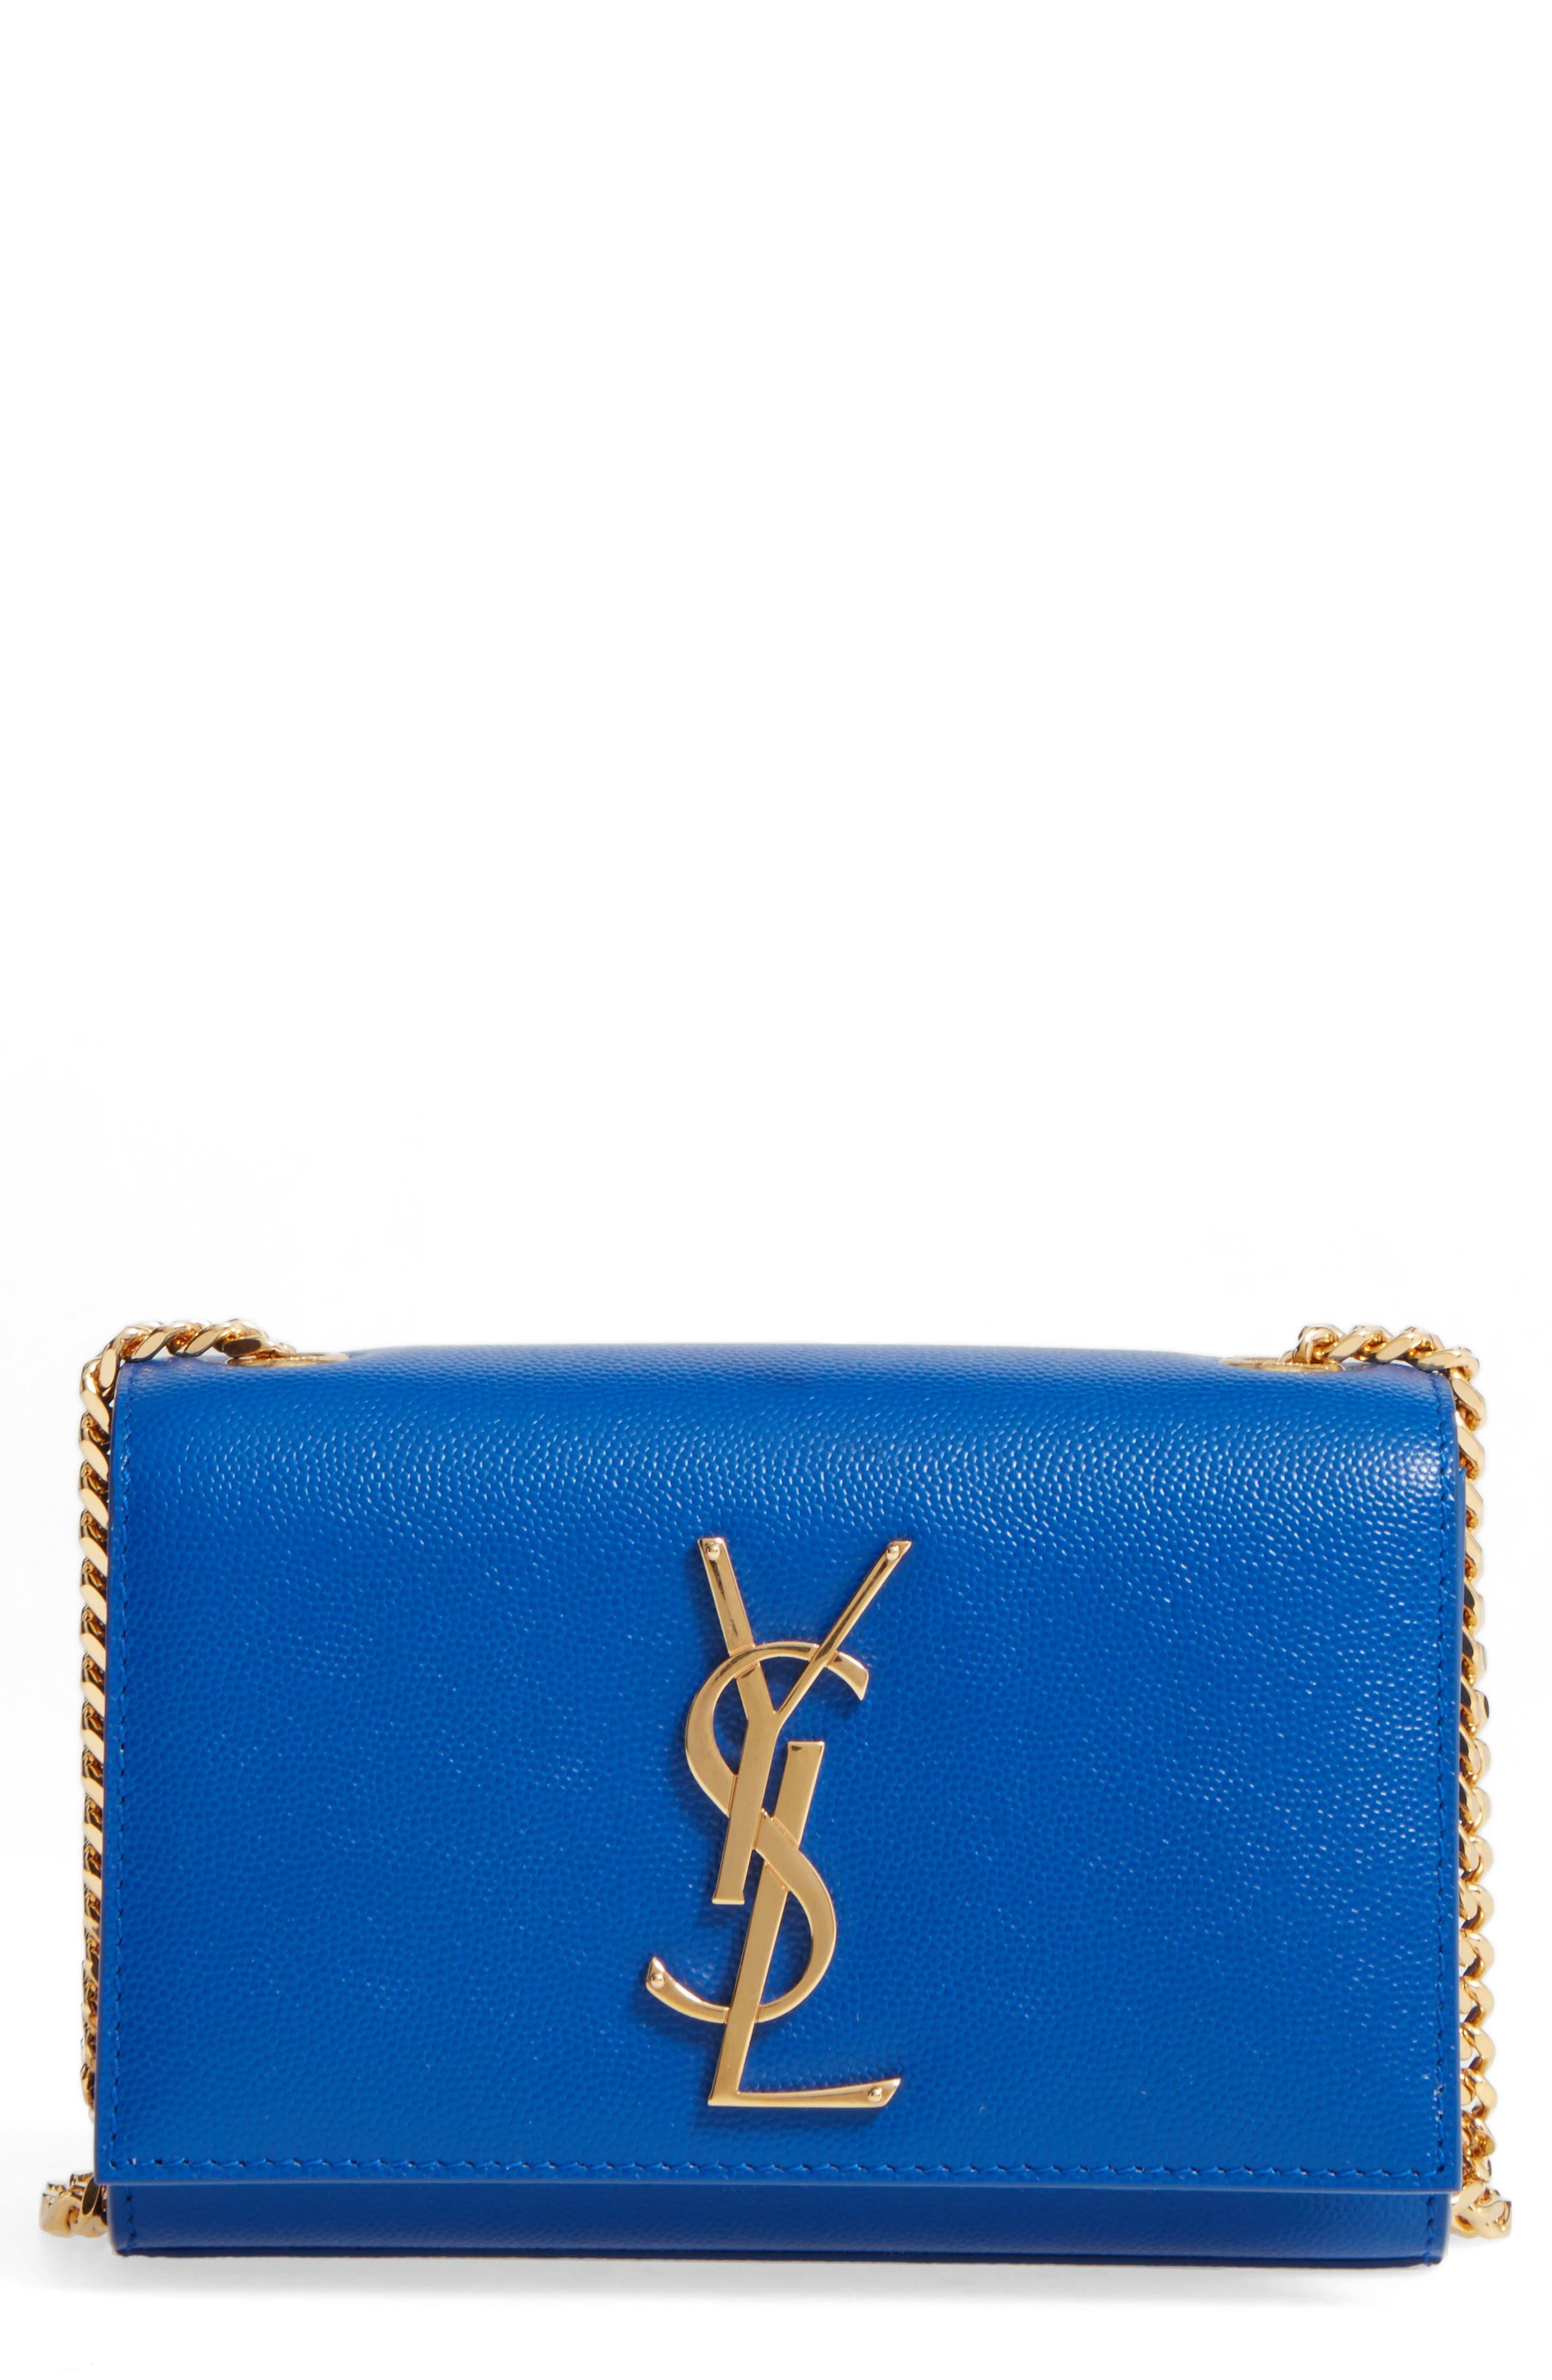 SAINT LAURENT, Small Kate Chain Crossbody Bag, Main thumbnail 1, color, ELECTRIC BLUE